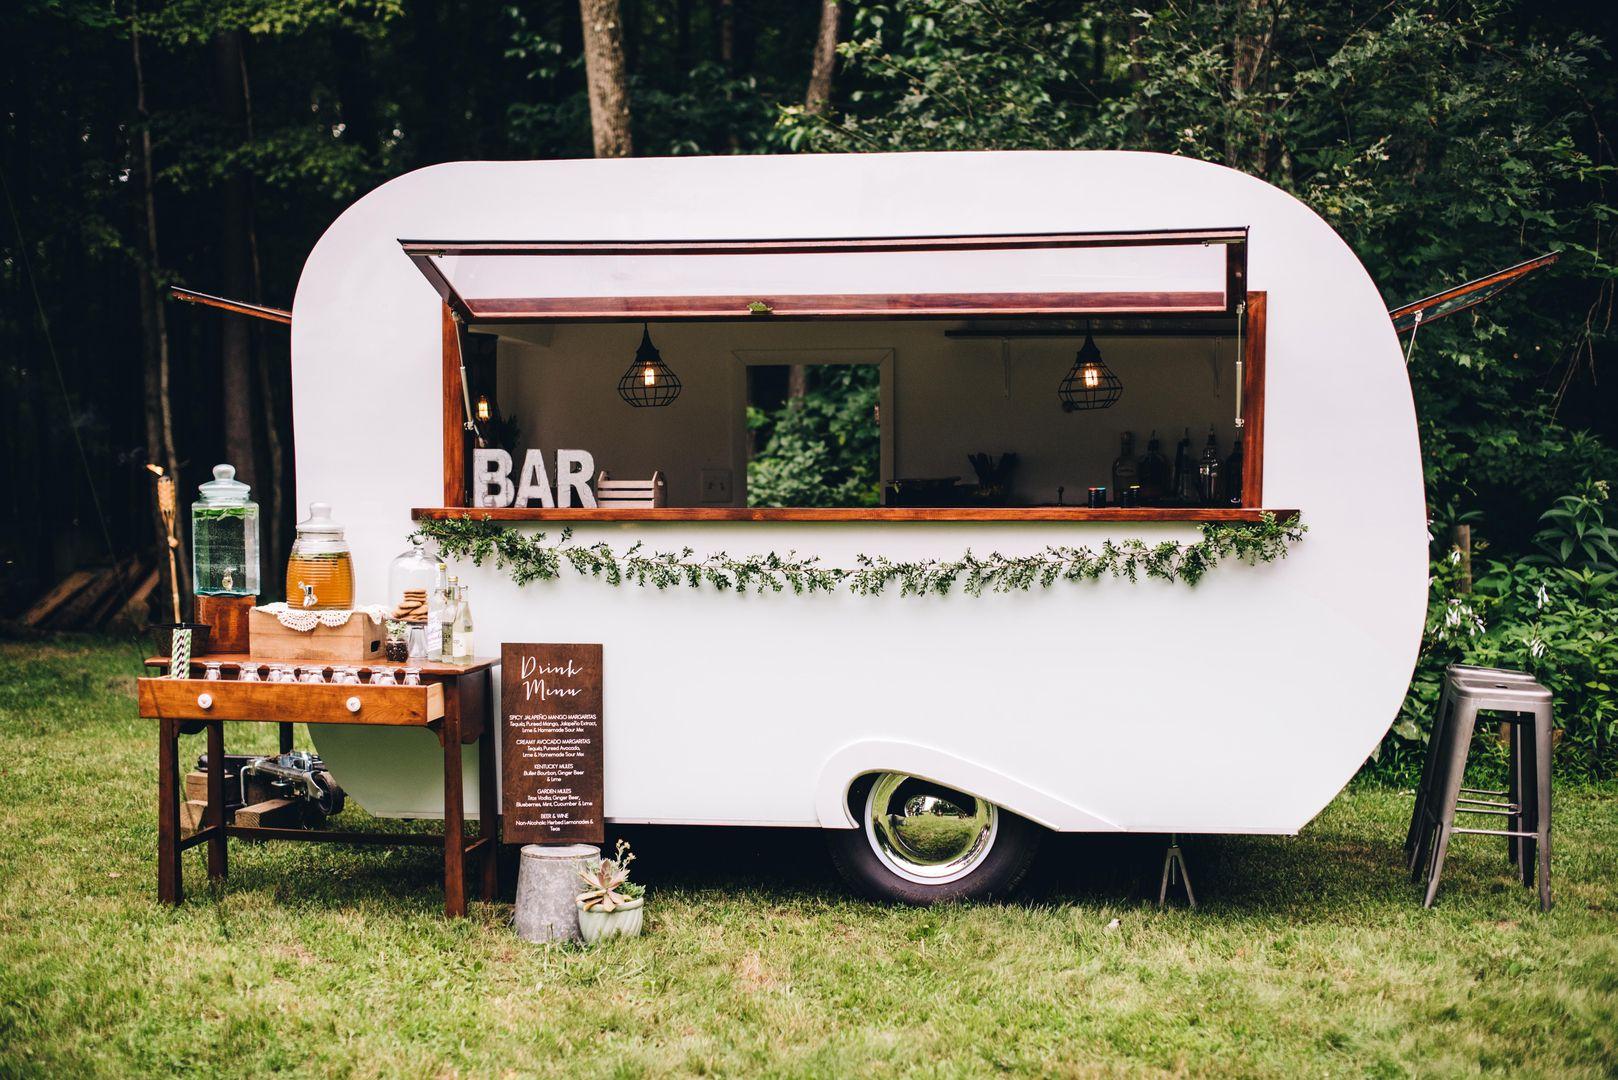 Sweet Water Caravan Mobile coffee shop, Mobile cafe